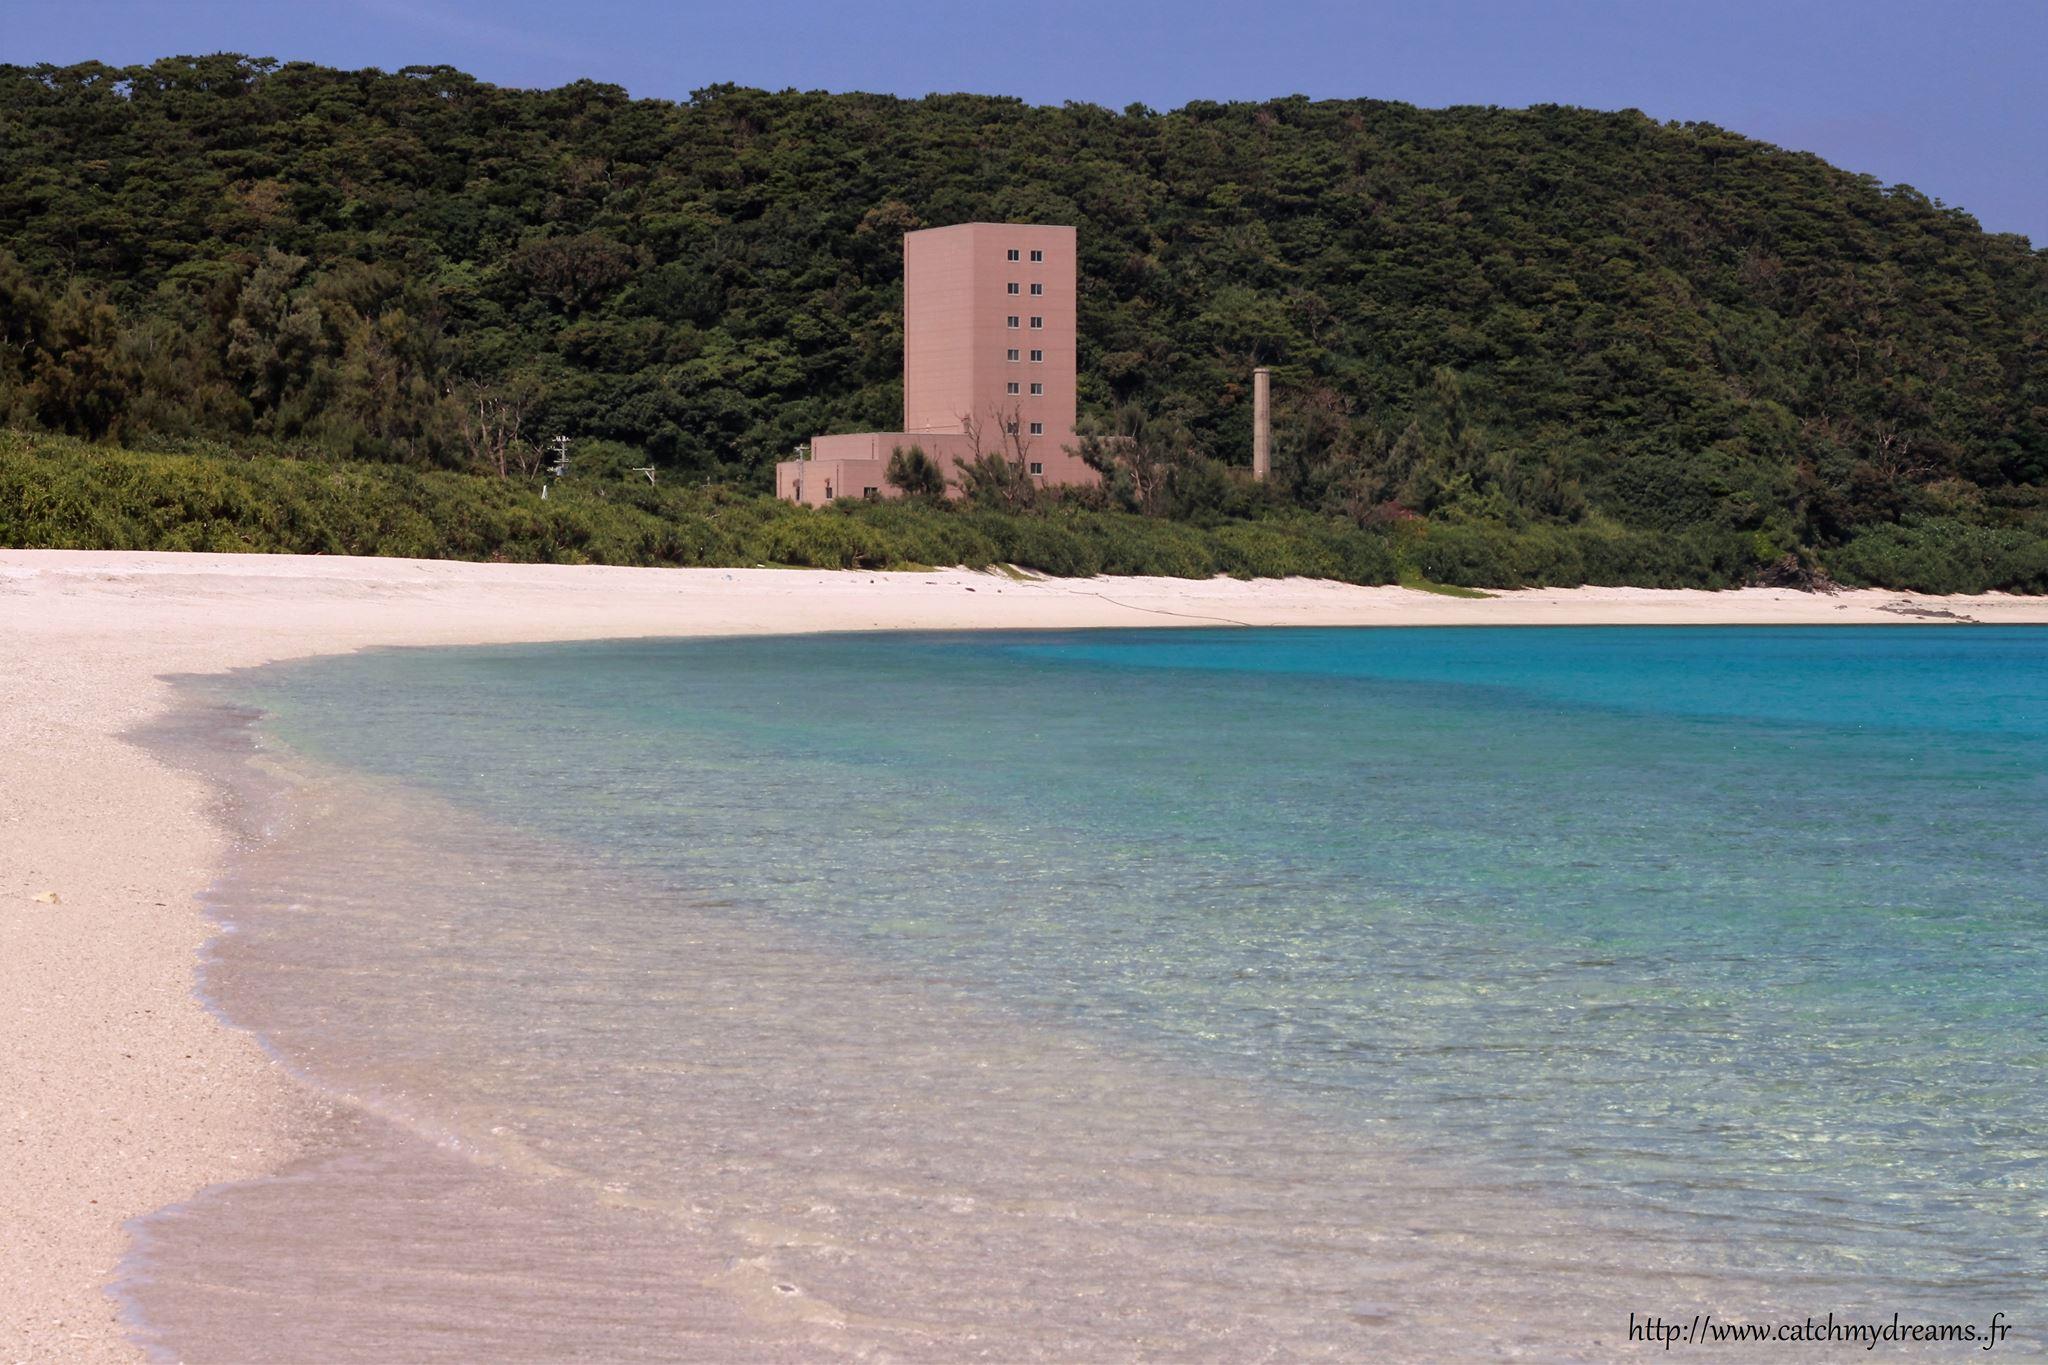 Visiter Okinawa et l'ile Zamami